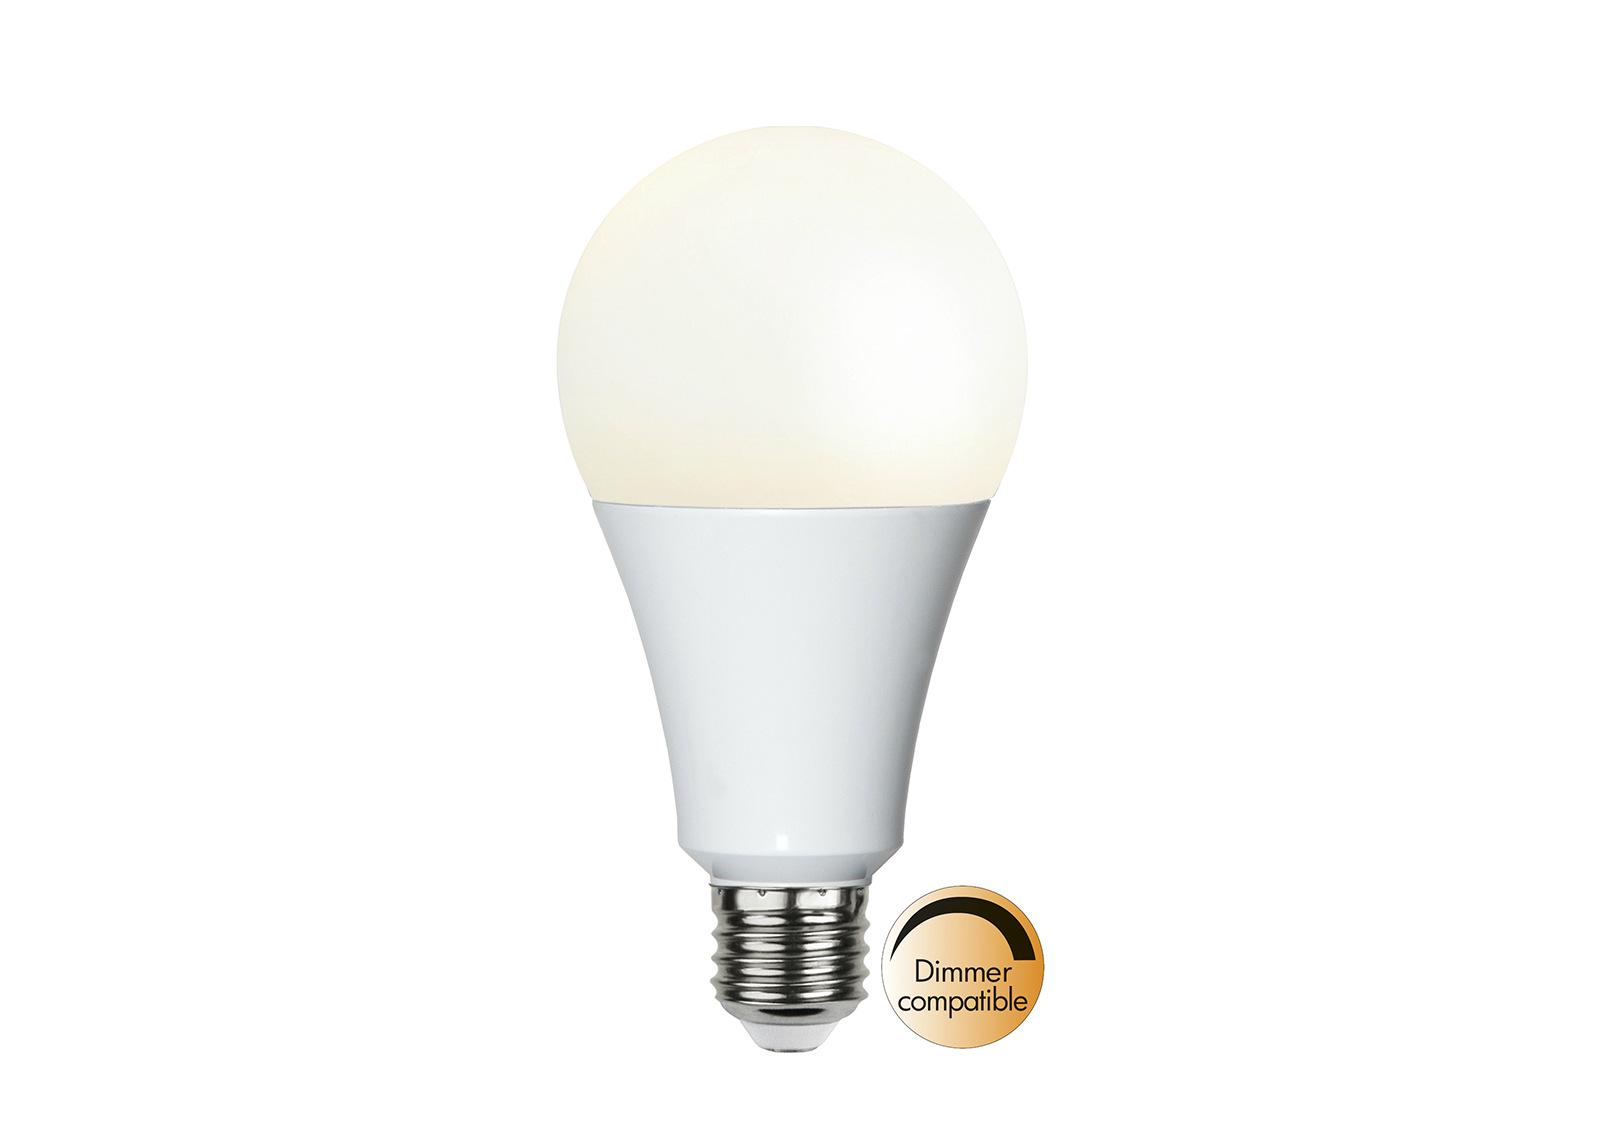 LED sähkölamppu E27 19 W